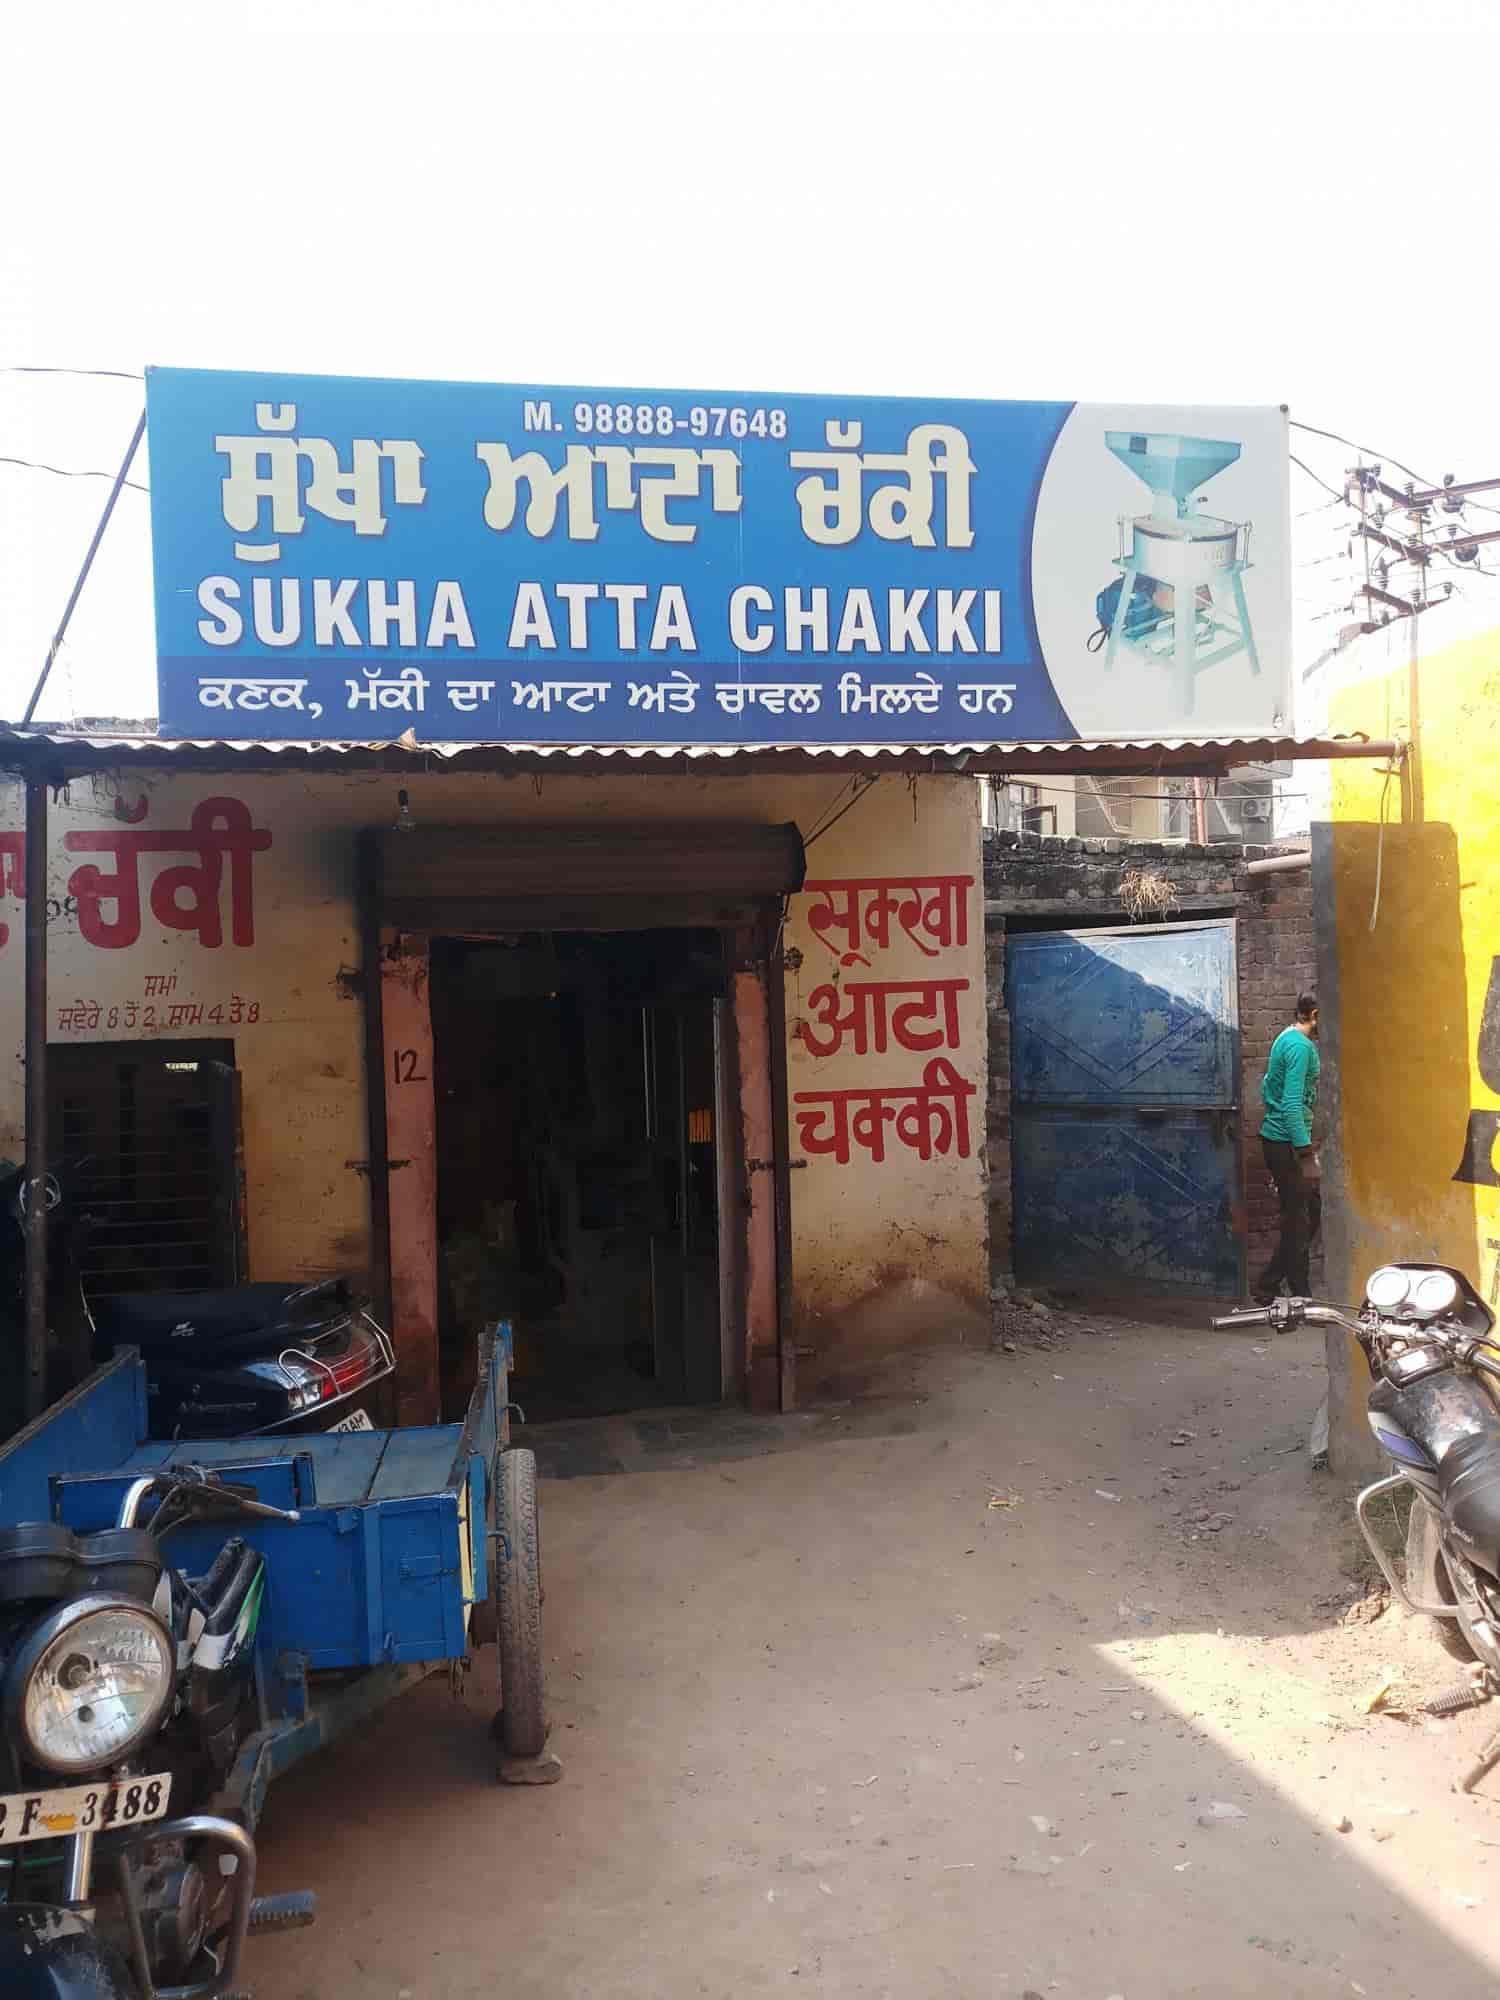 Sukha Atta Chakki, Mohali - Flour Mills in Chandigarh - Justdial